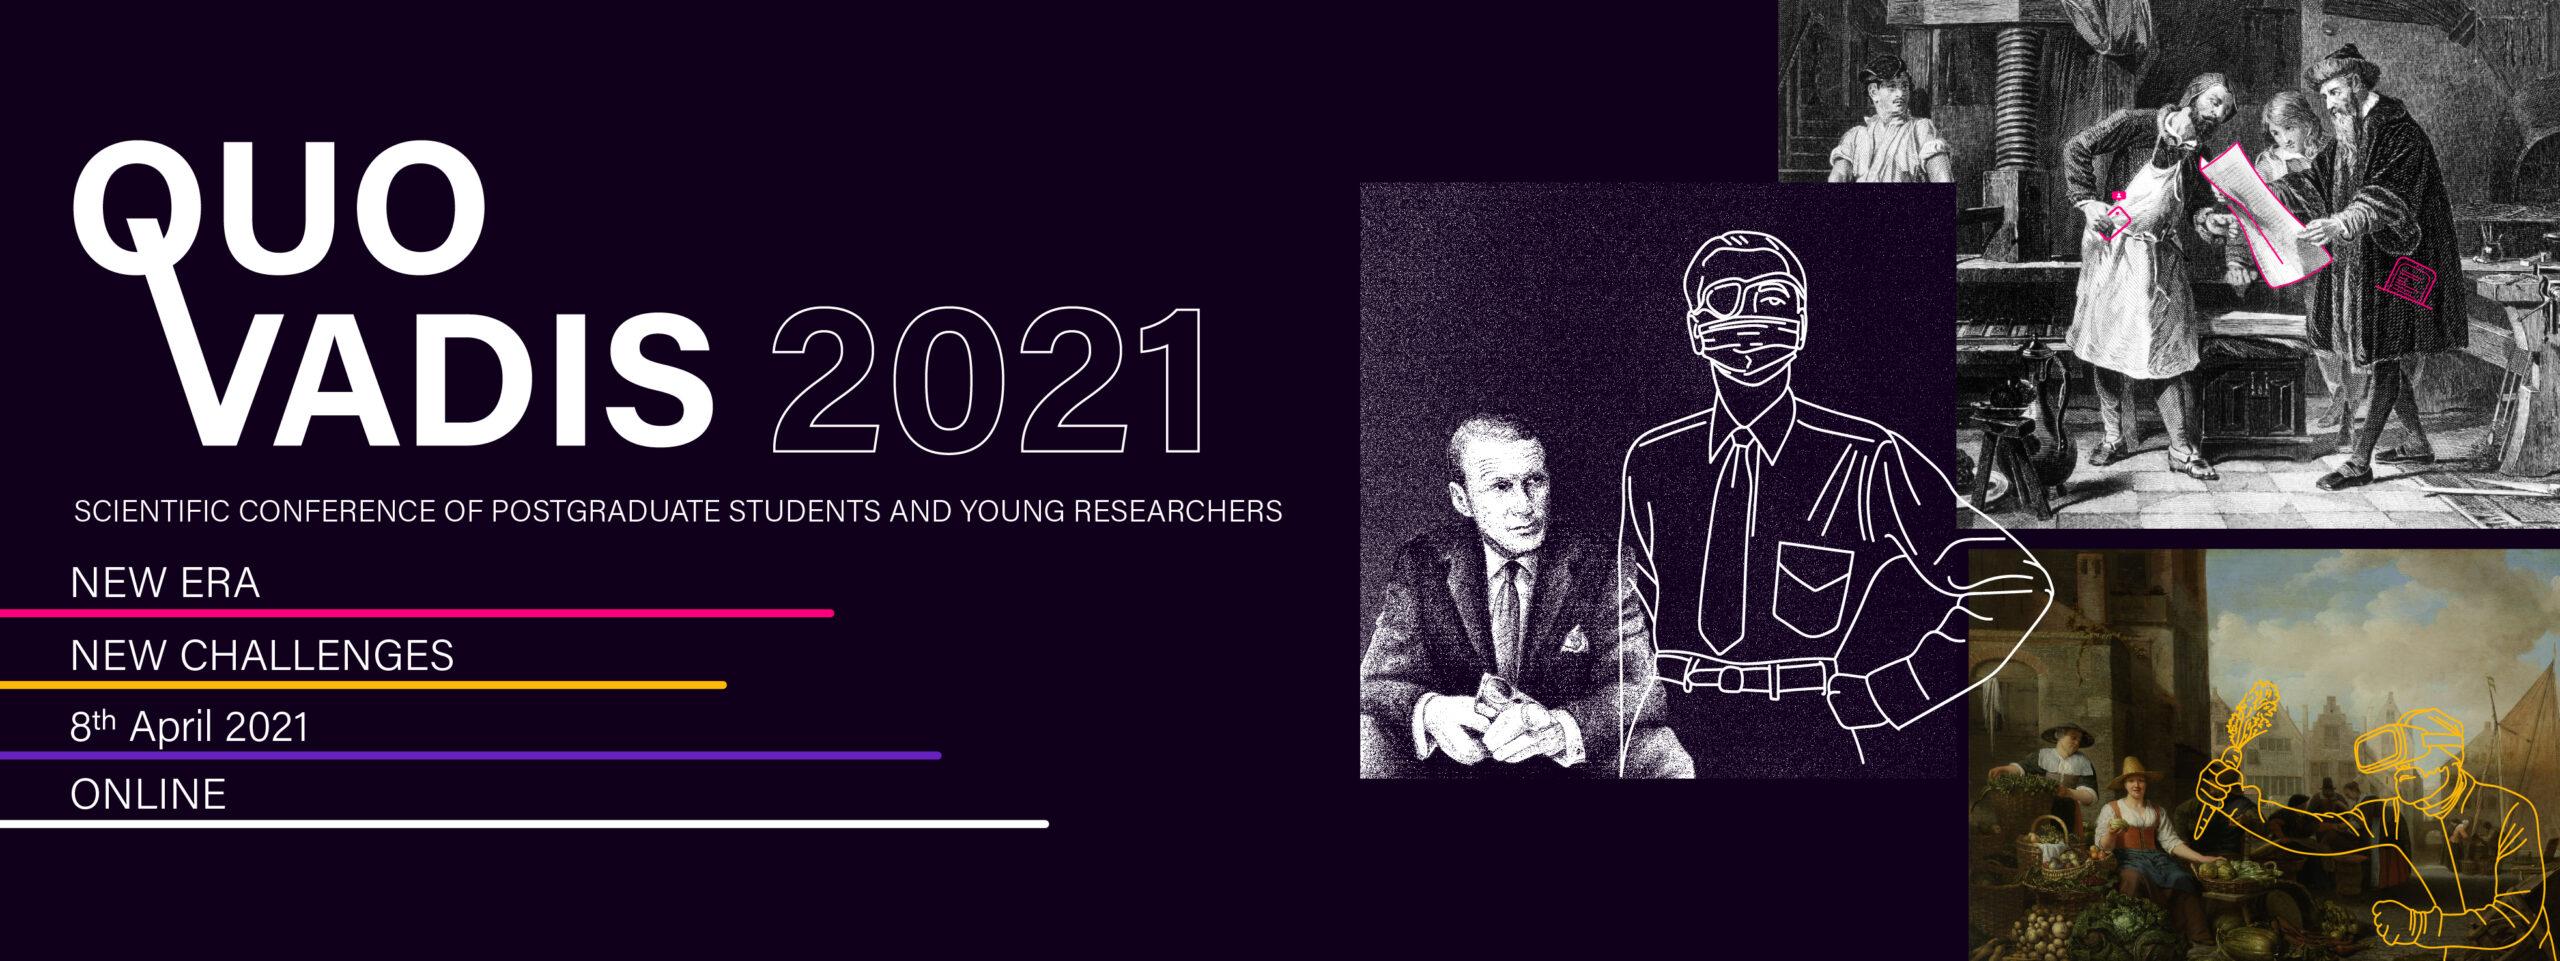 quo vadis 2021 eng